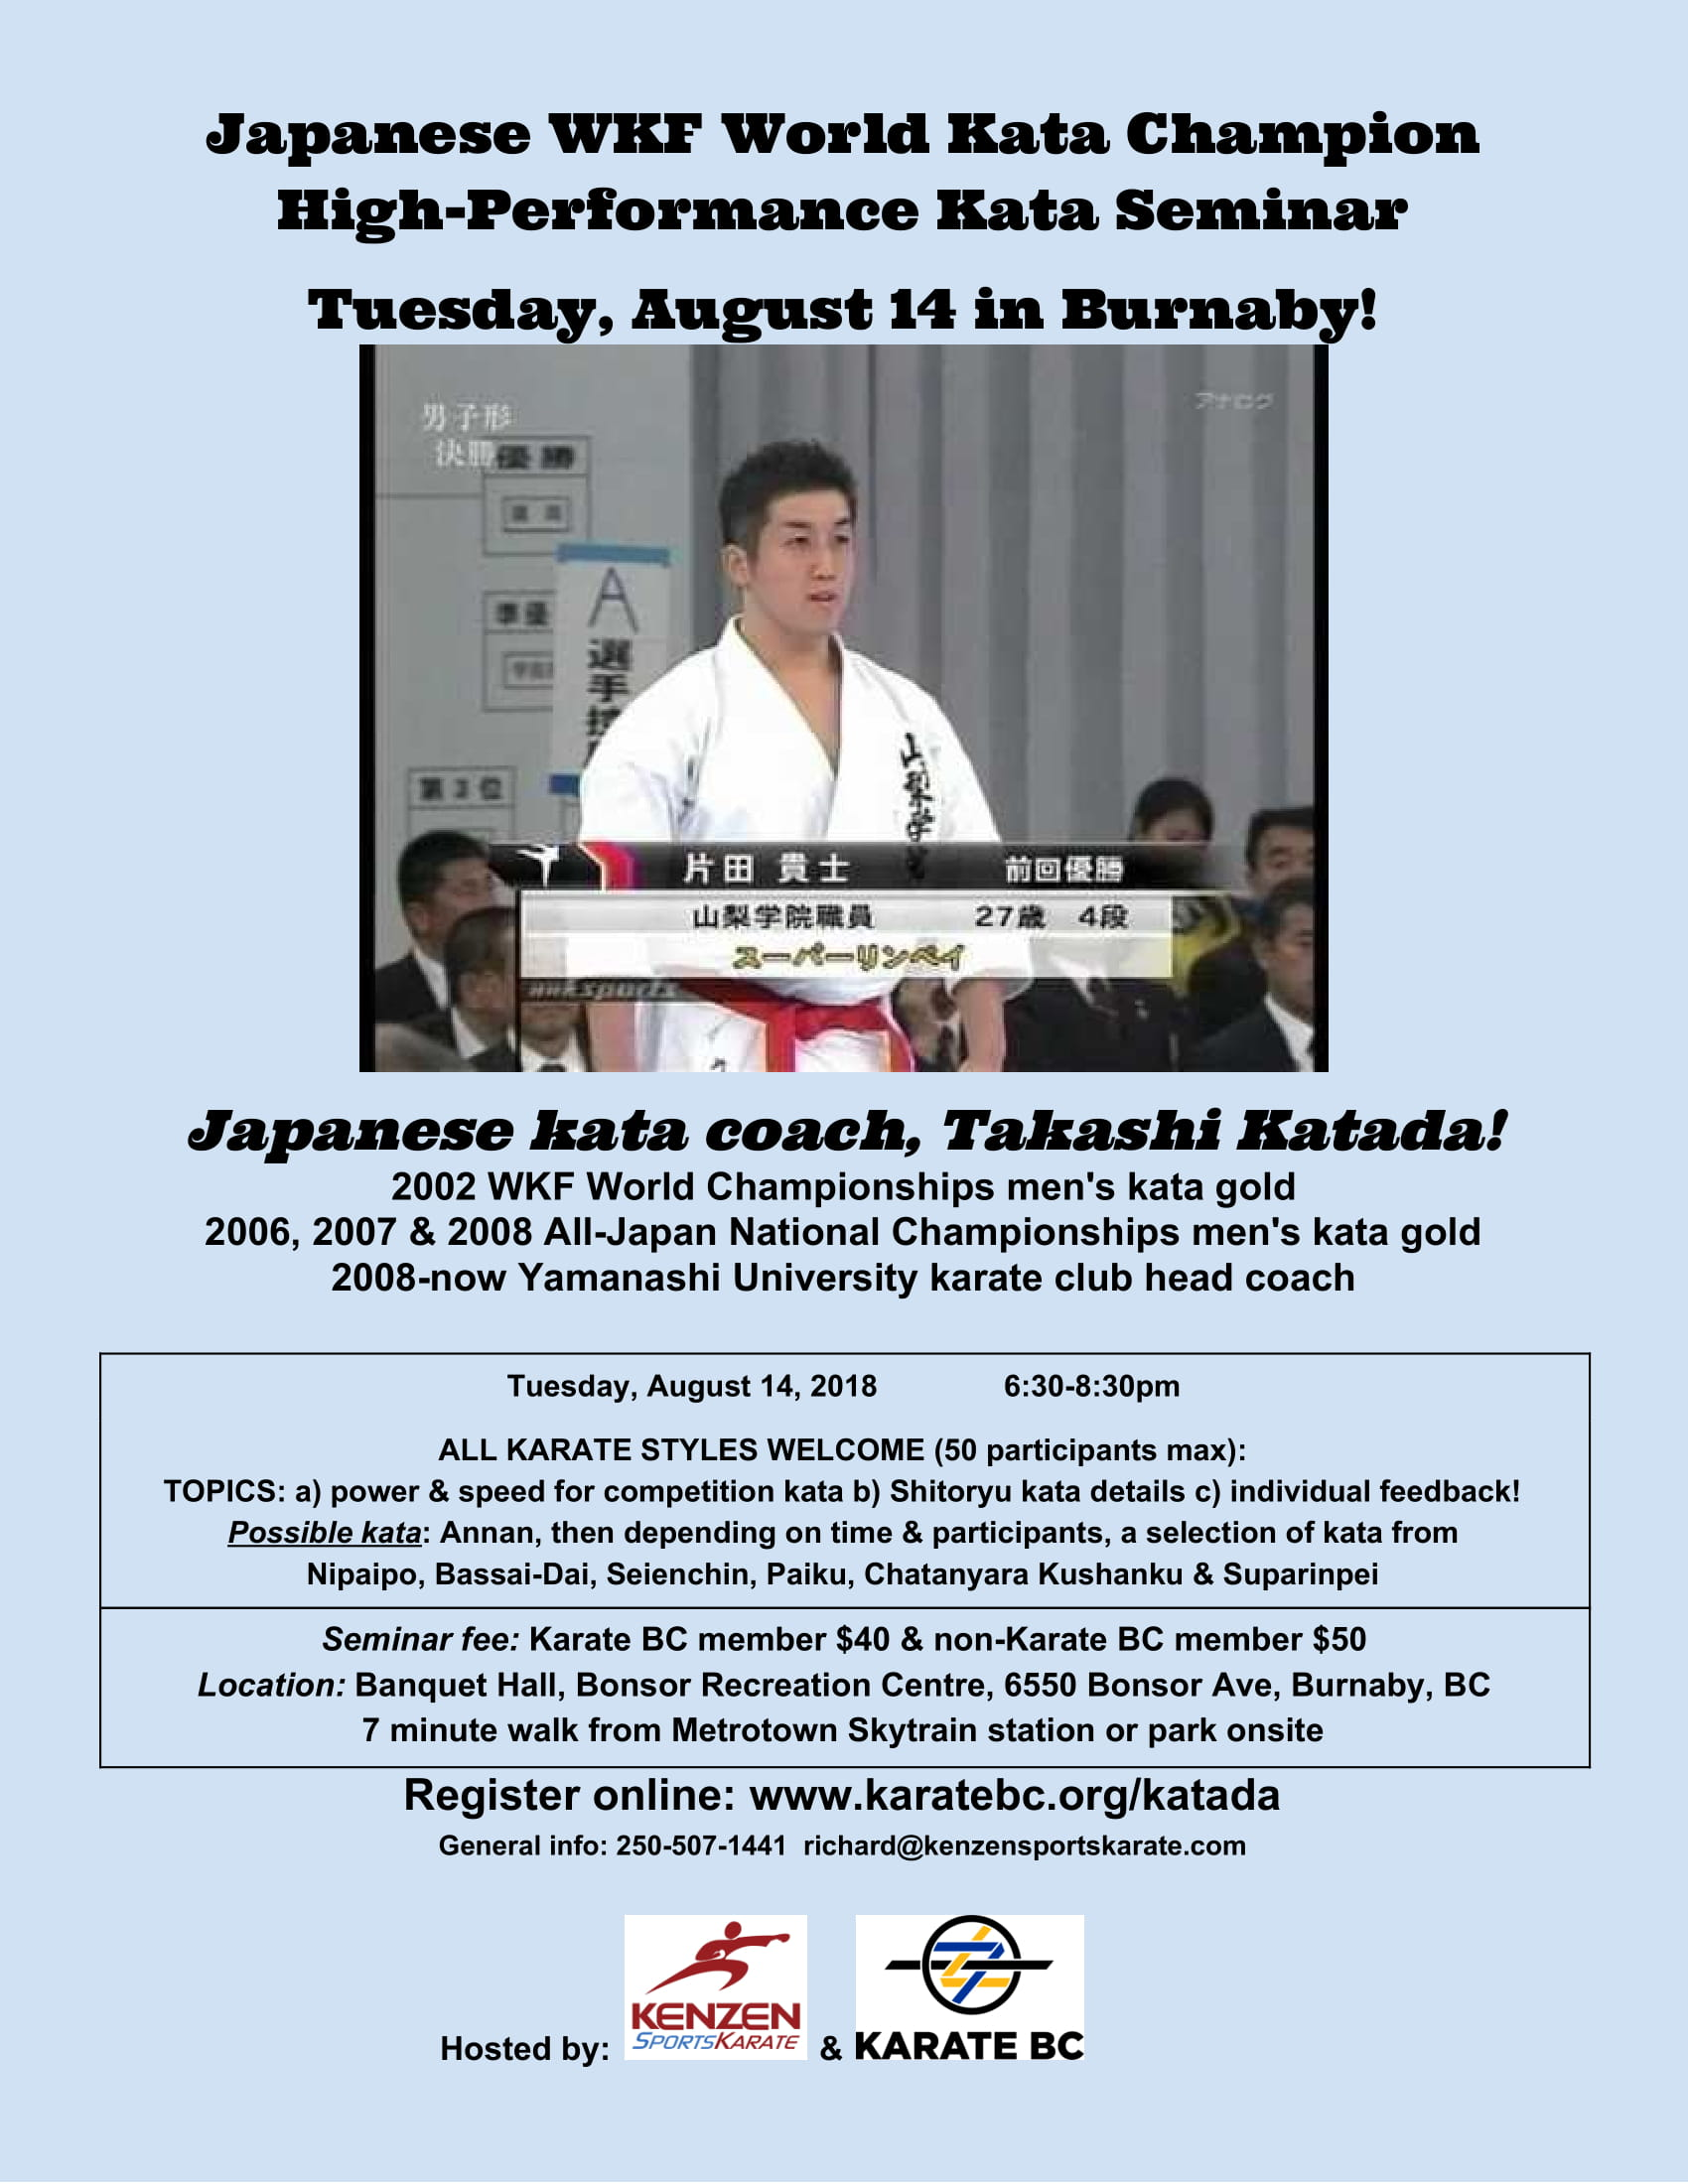 Japanese WKF World Kata Champion High-Performance Kata